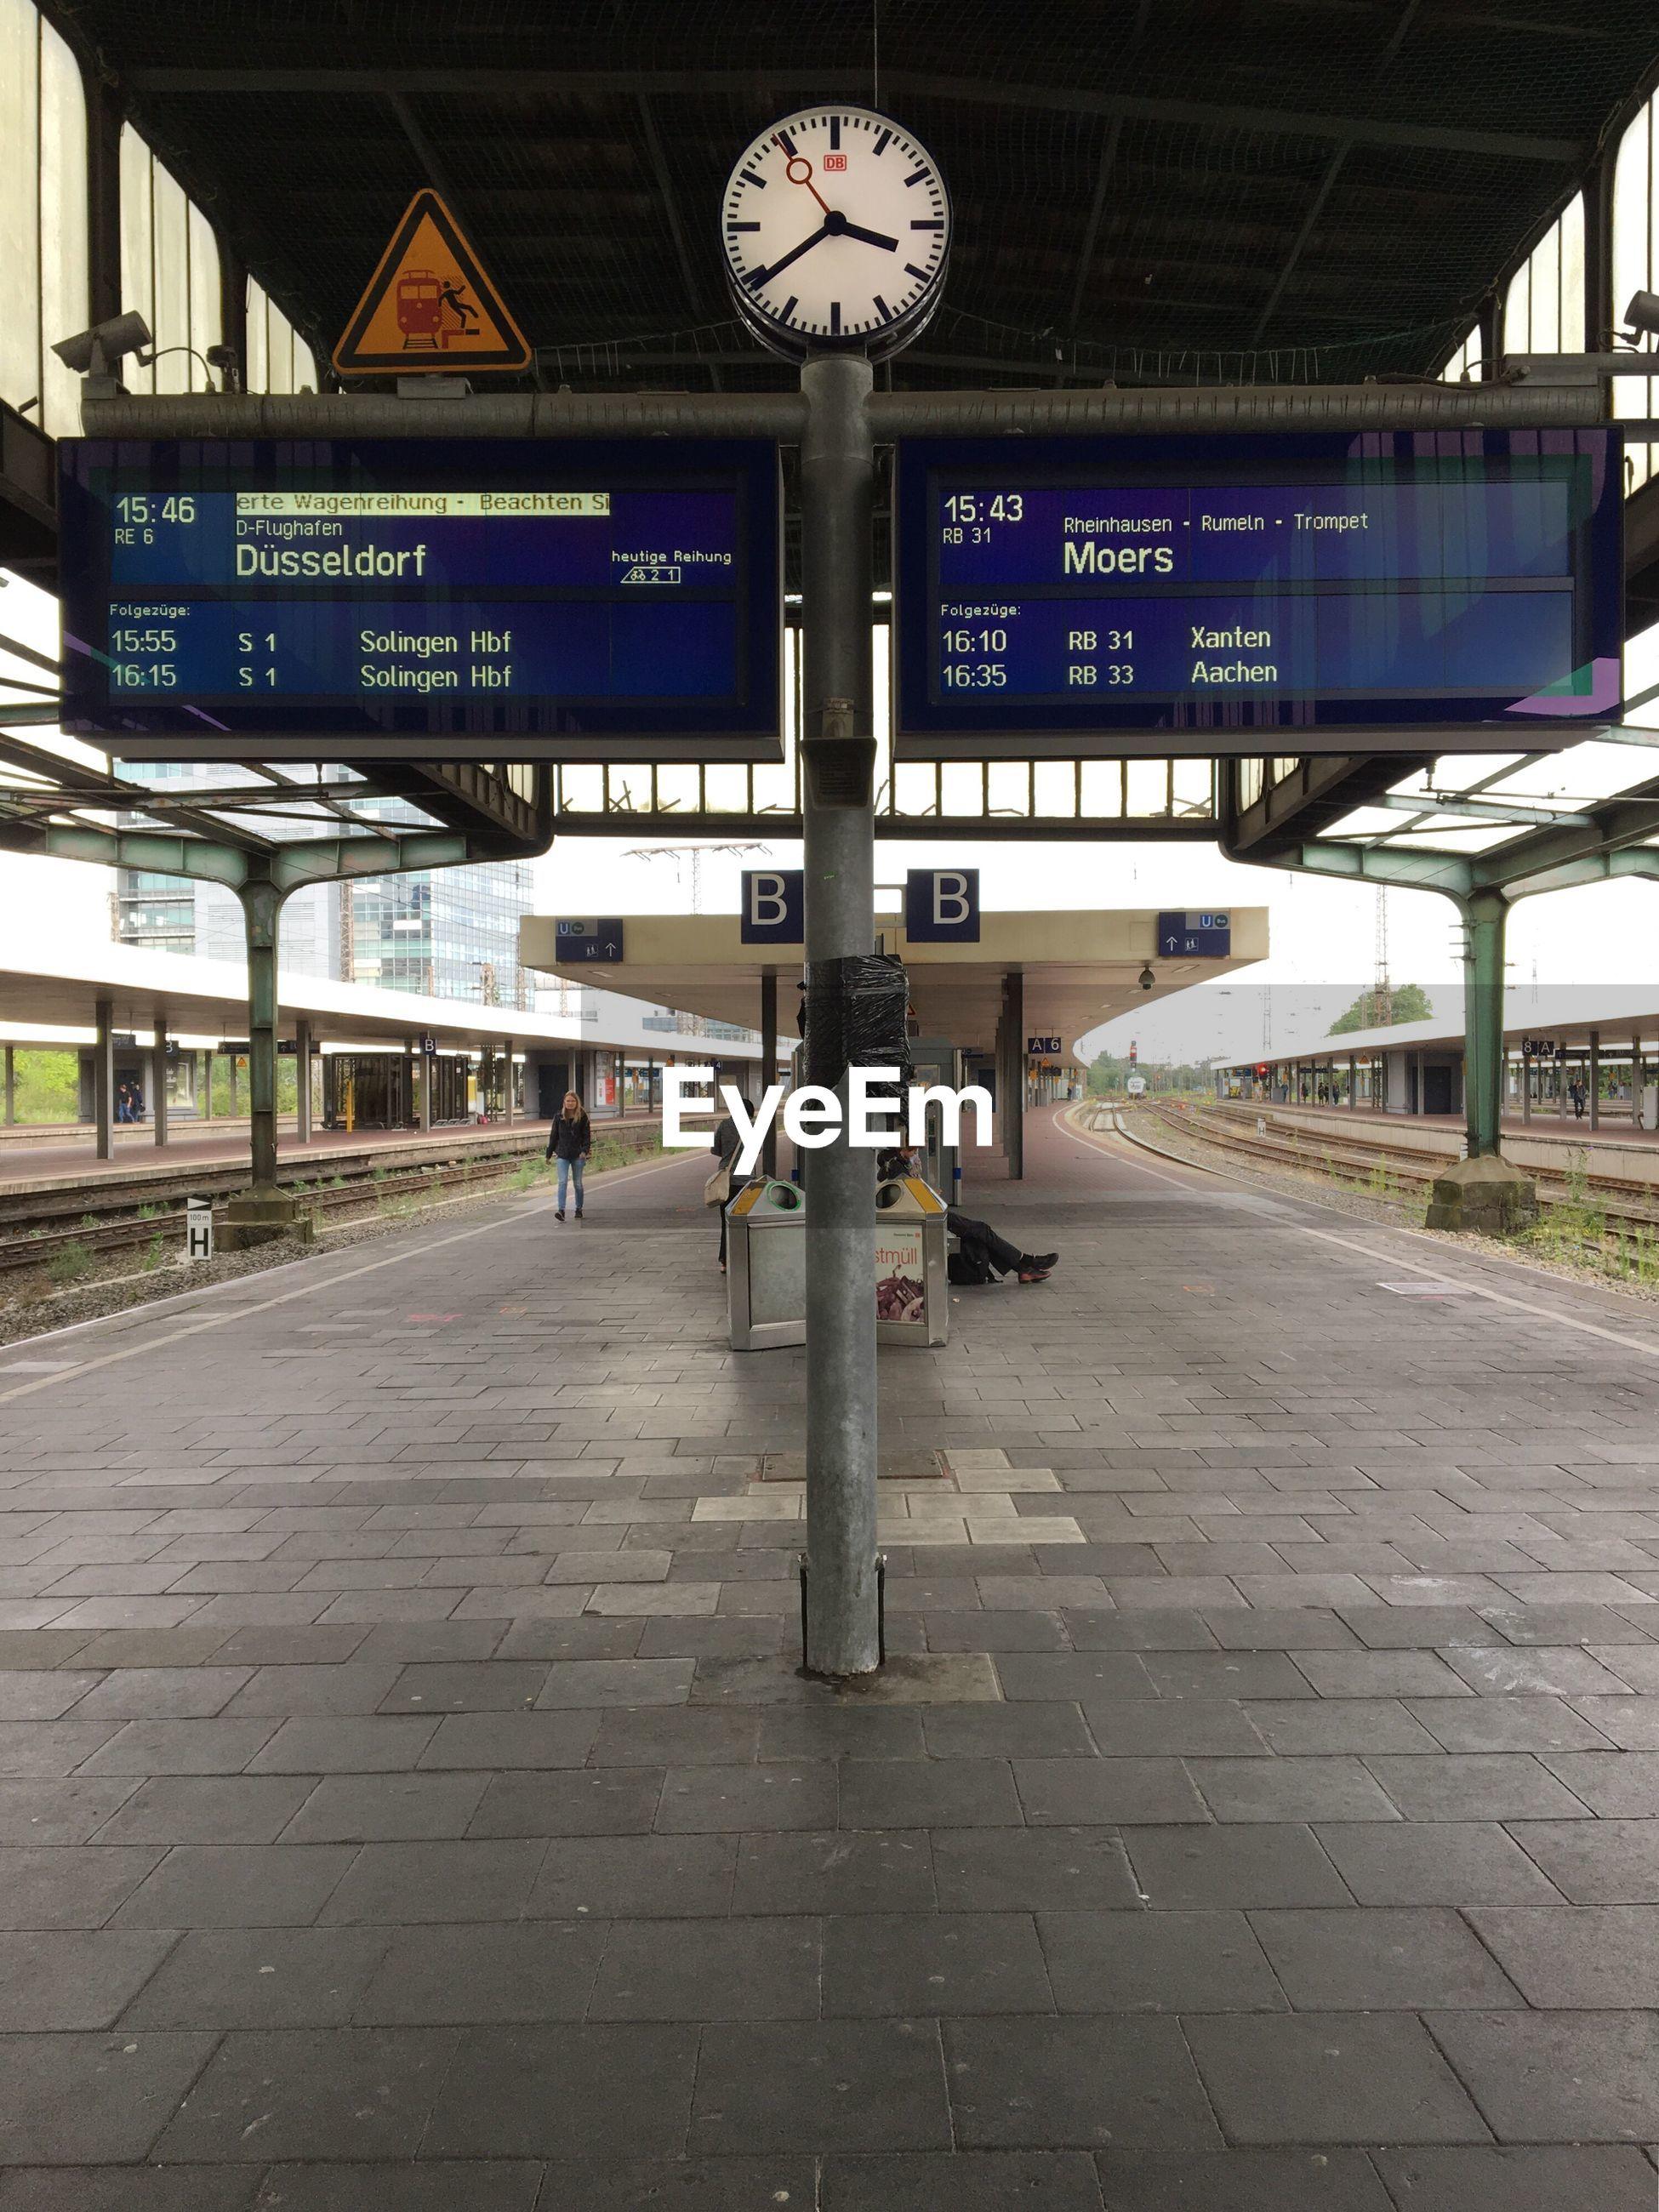 Clock and arrival departure boards on railroad station platform